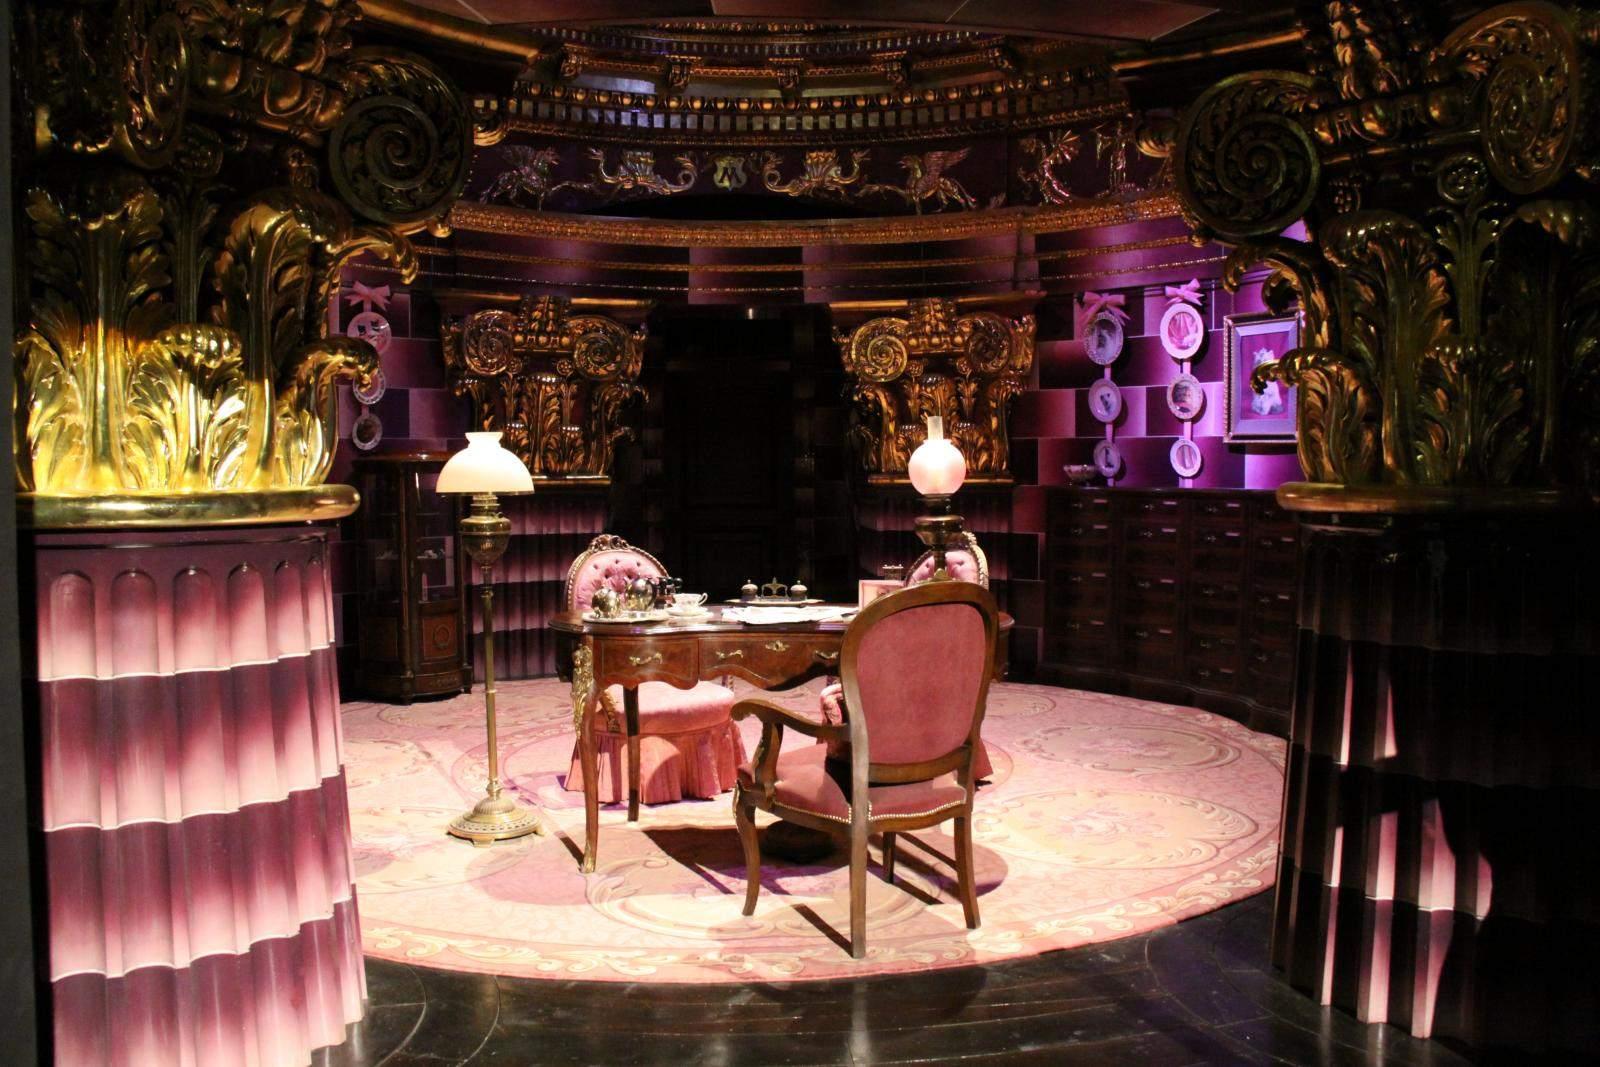 making harry potter15 The Making of Harry Potter, Warner Bros Studio London